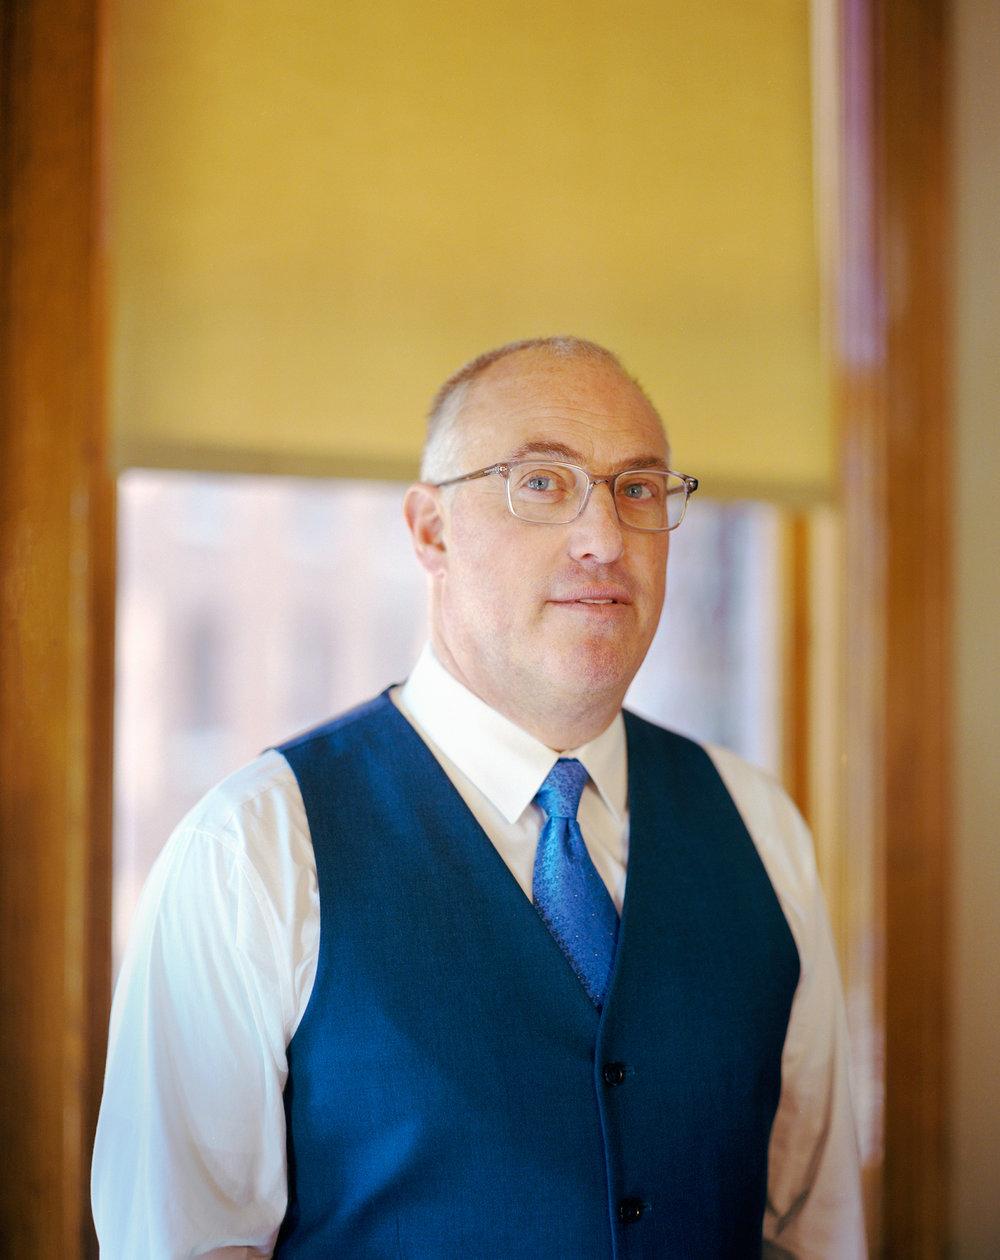 Steven Greenberg, R. Kelly's Lawyer, Chicago